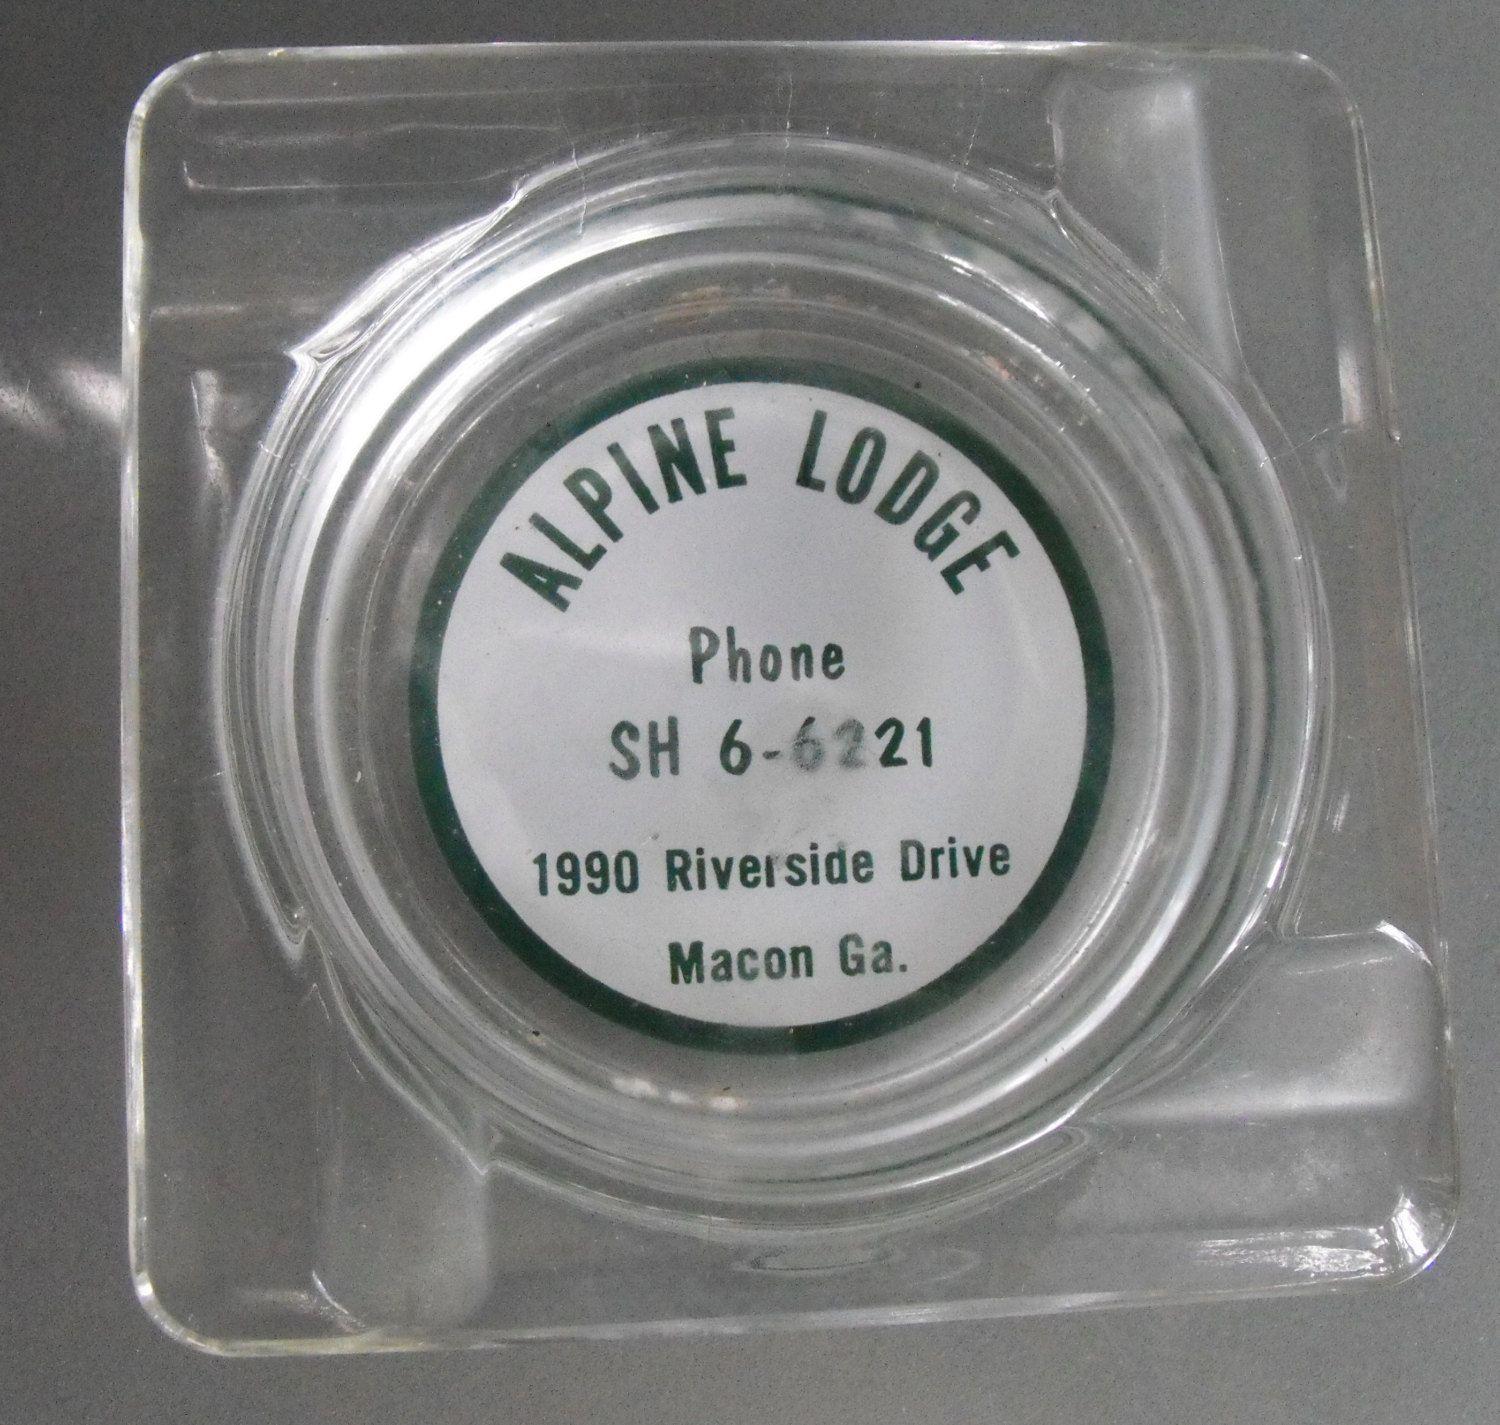 Alpine Lodge Souvenir Ashtray, Macon, Georgia, Vintage Ashtray, Travel Souvenir, Smoking Accessory, Motor Lodge, Road Trip, Vacation Travel by ...